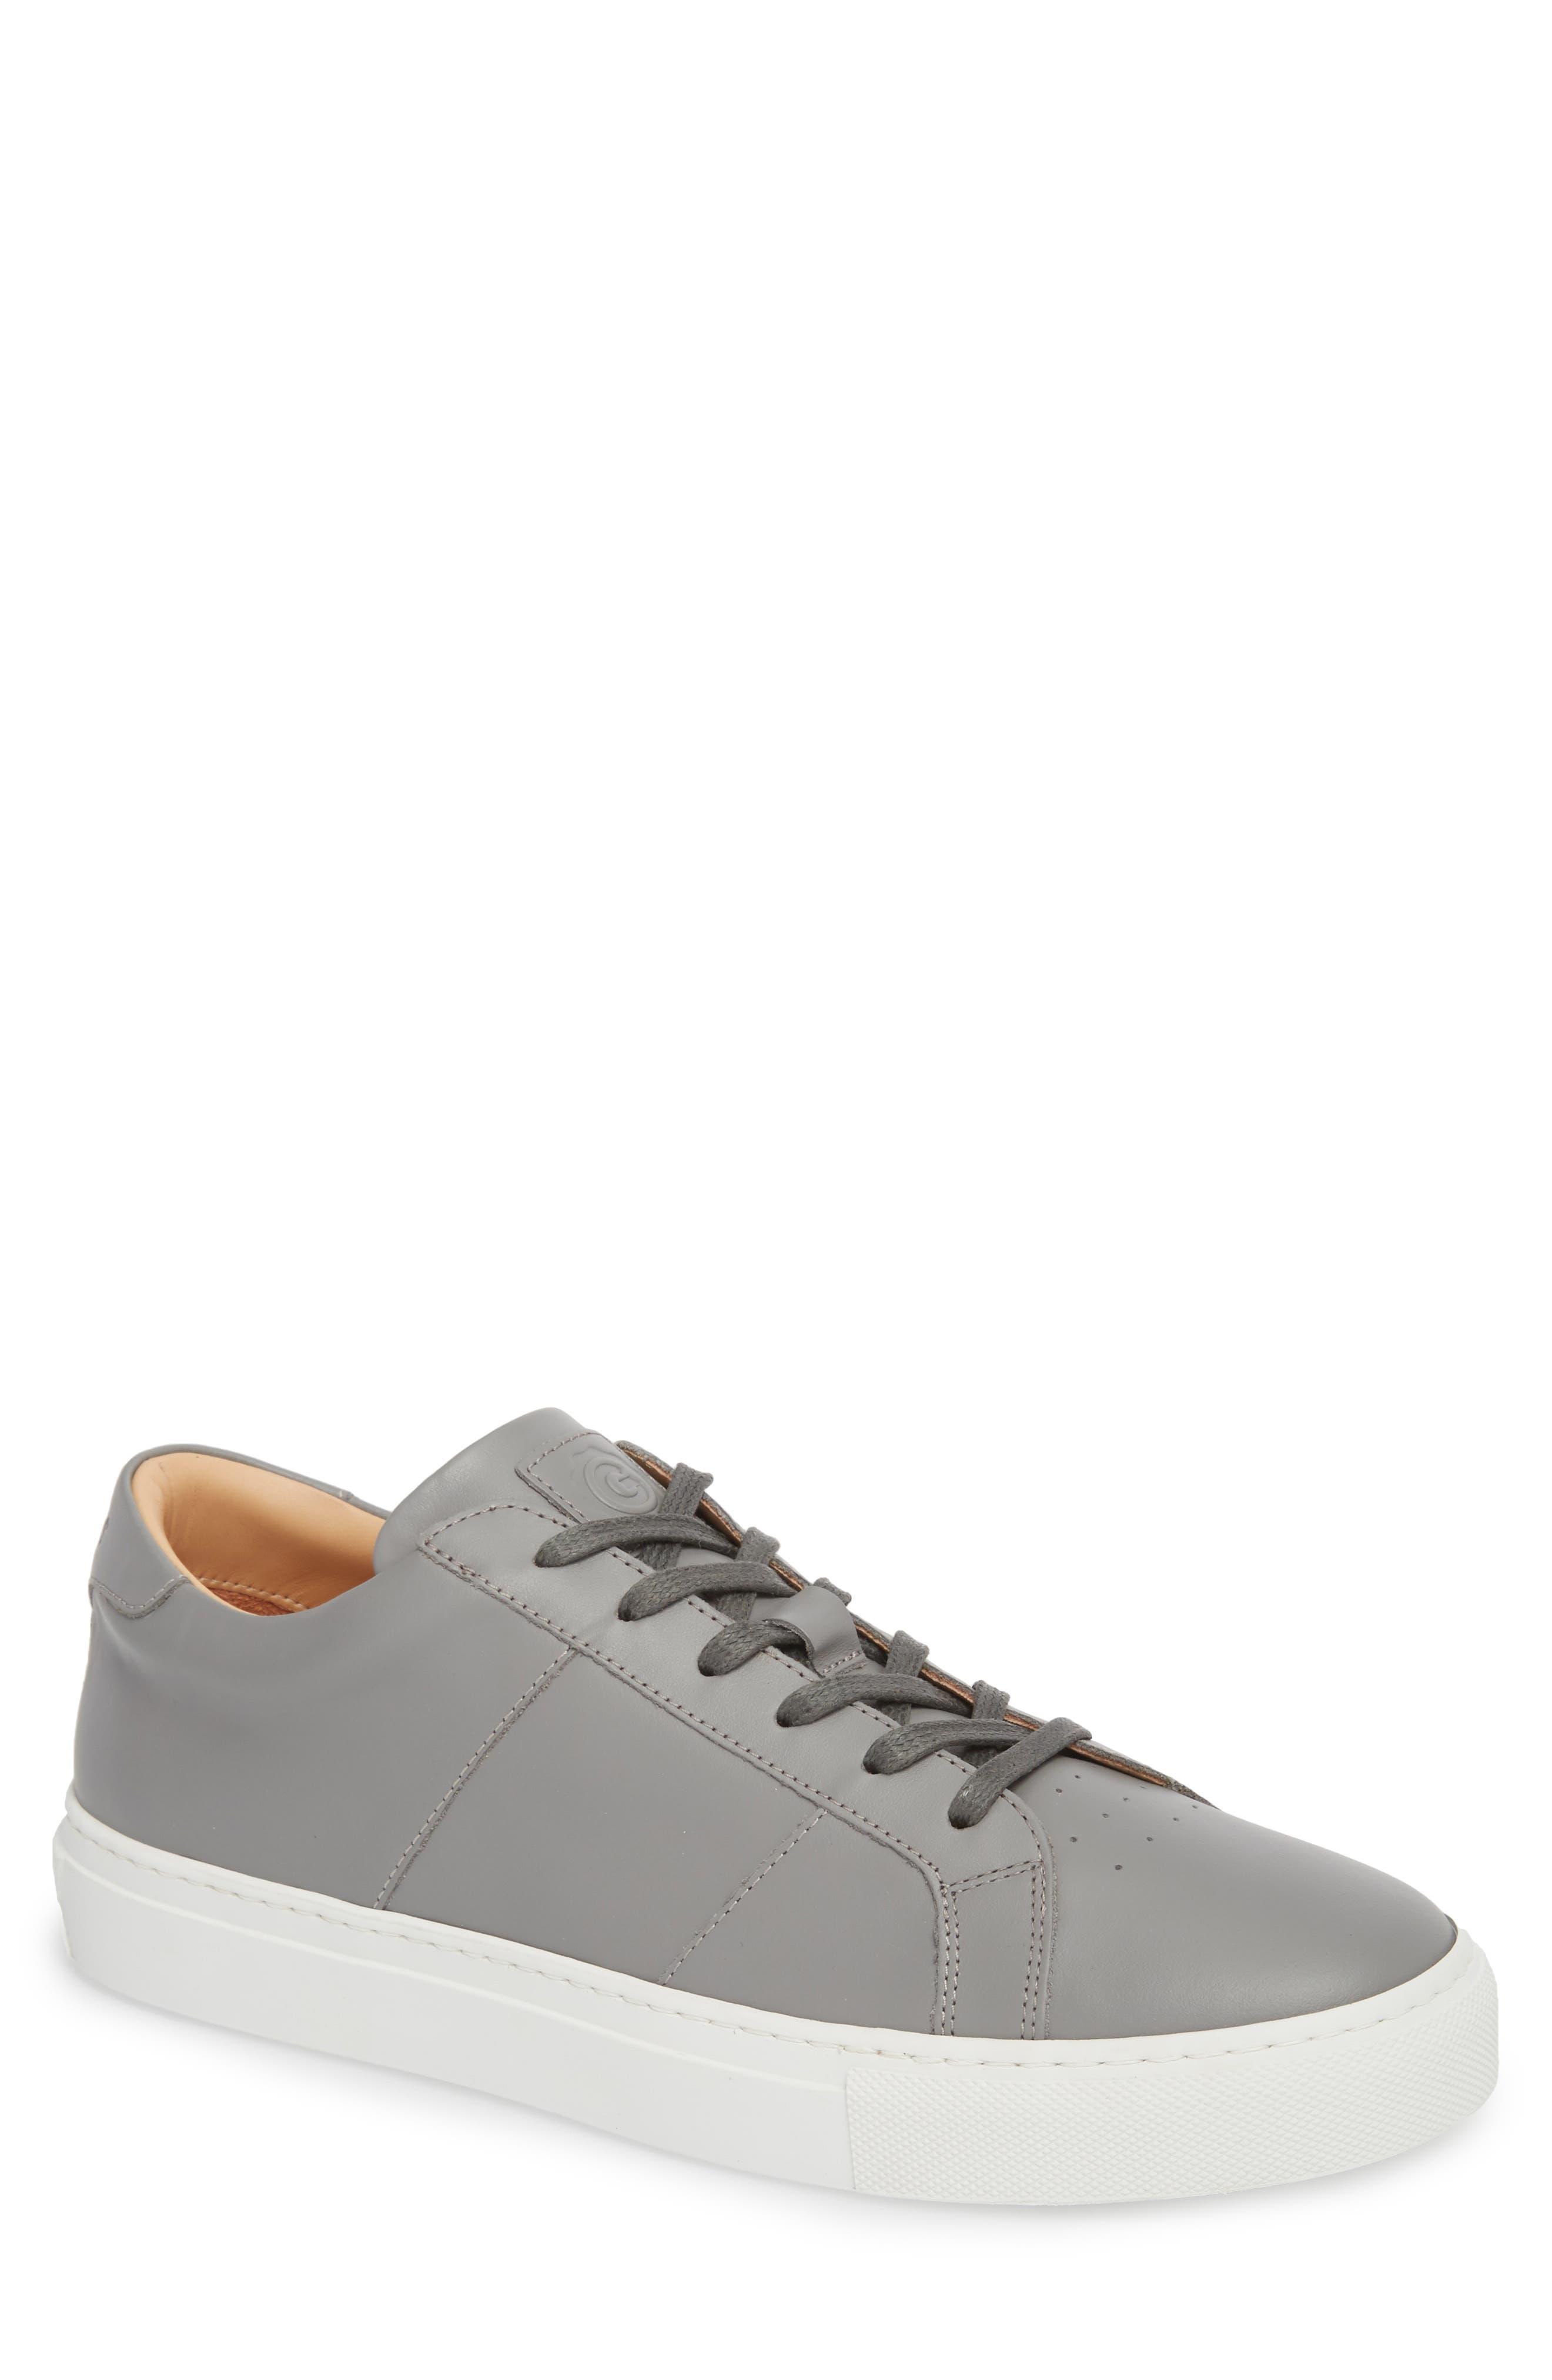 GREATS Royale Sneaker in Grey Leather